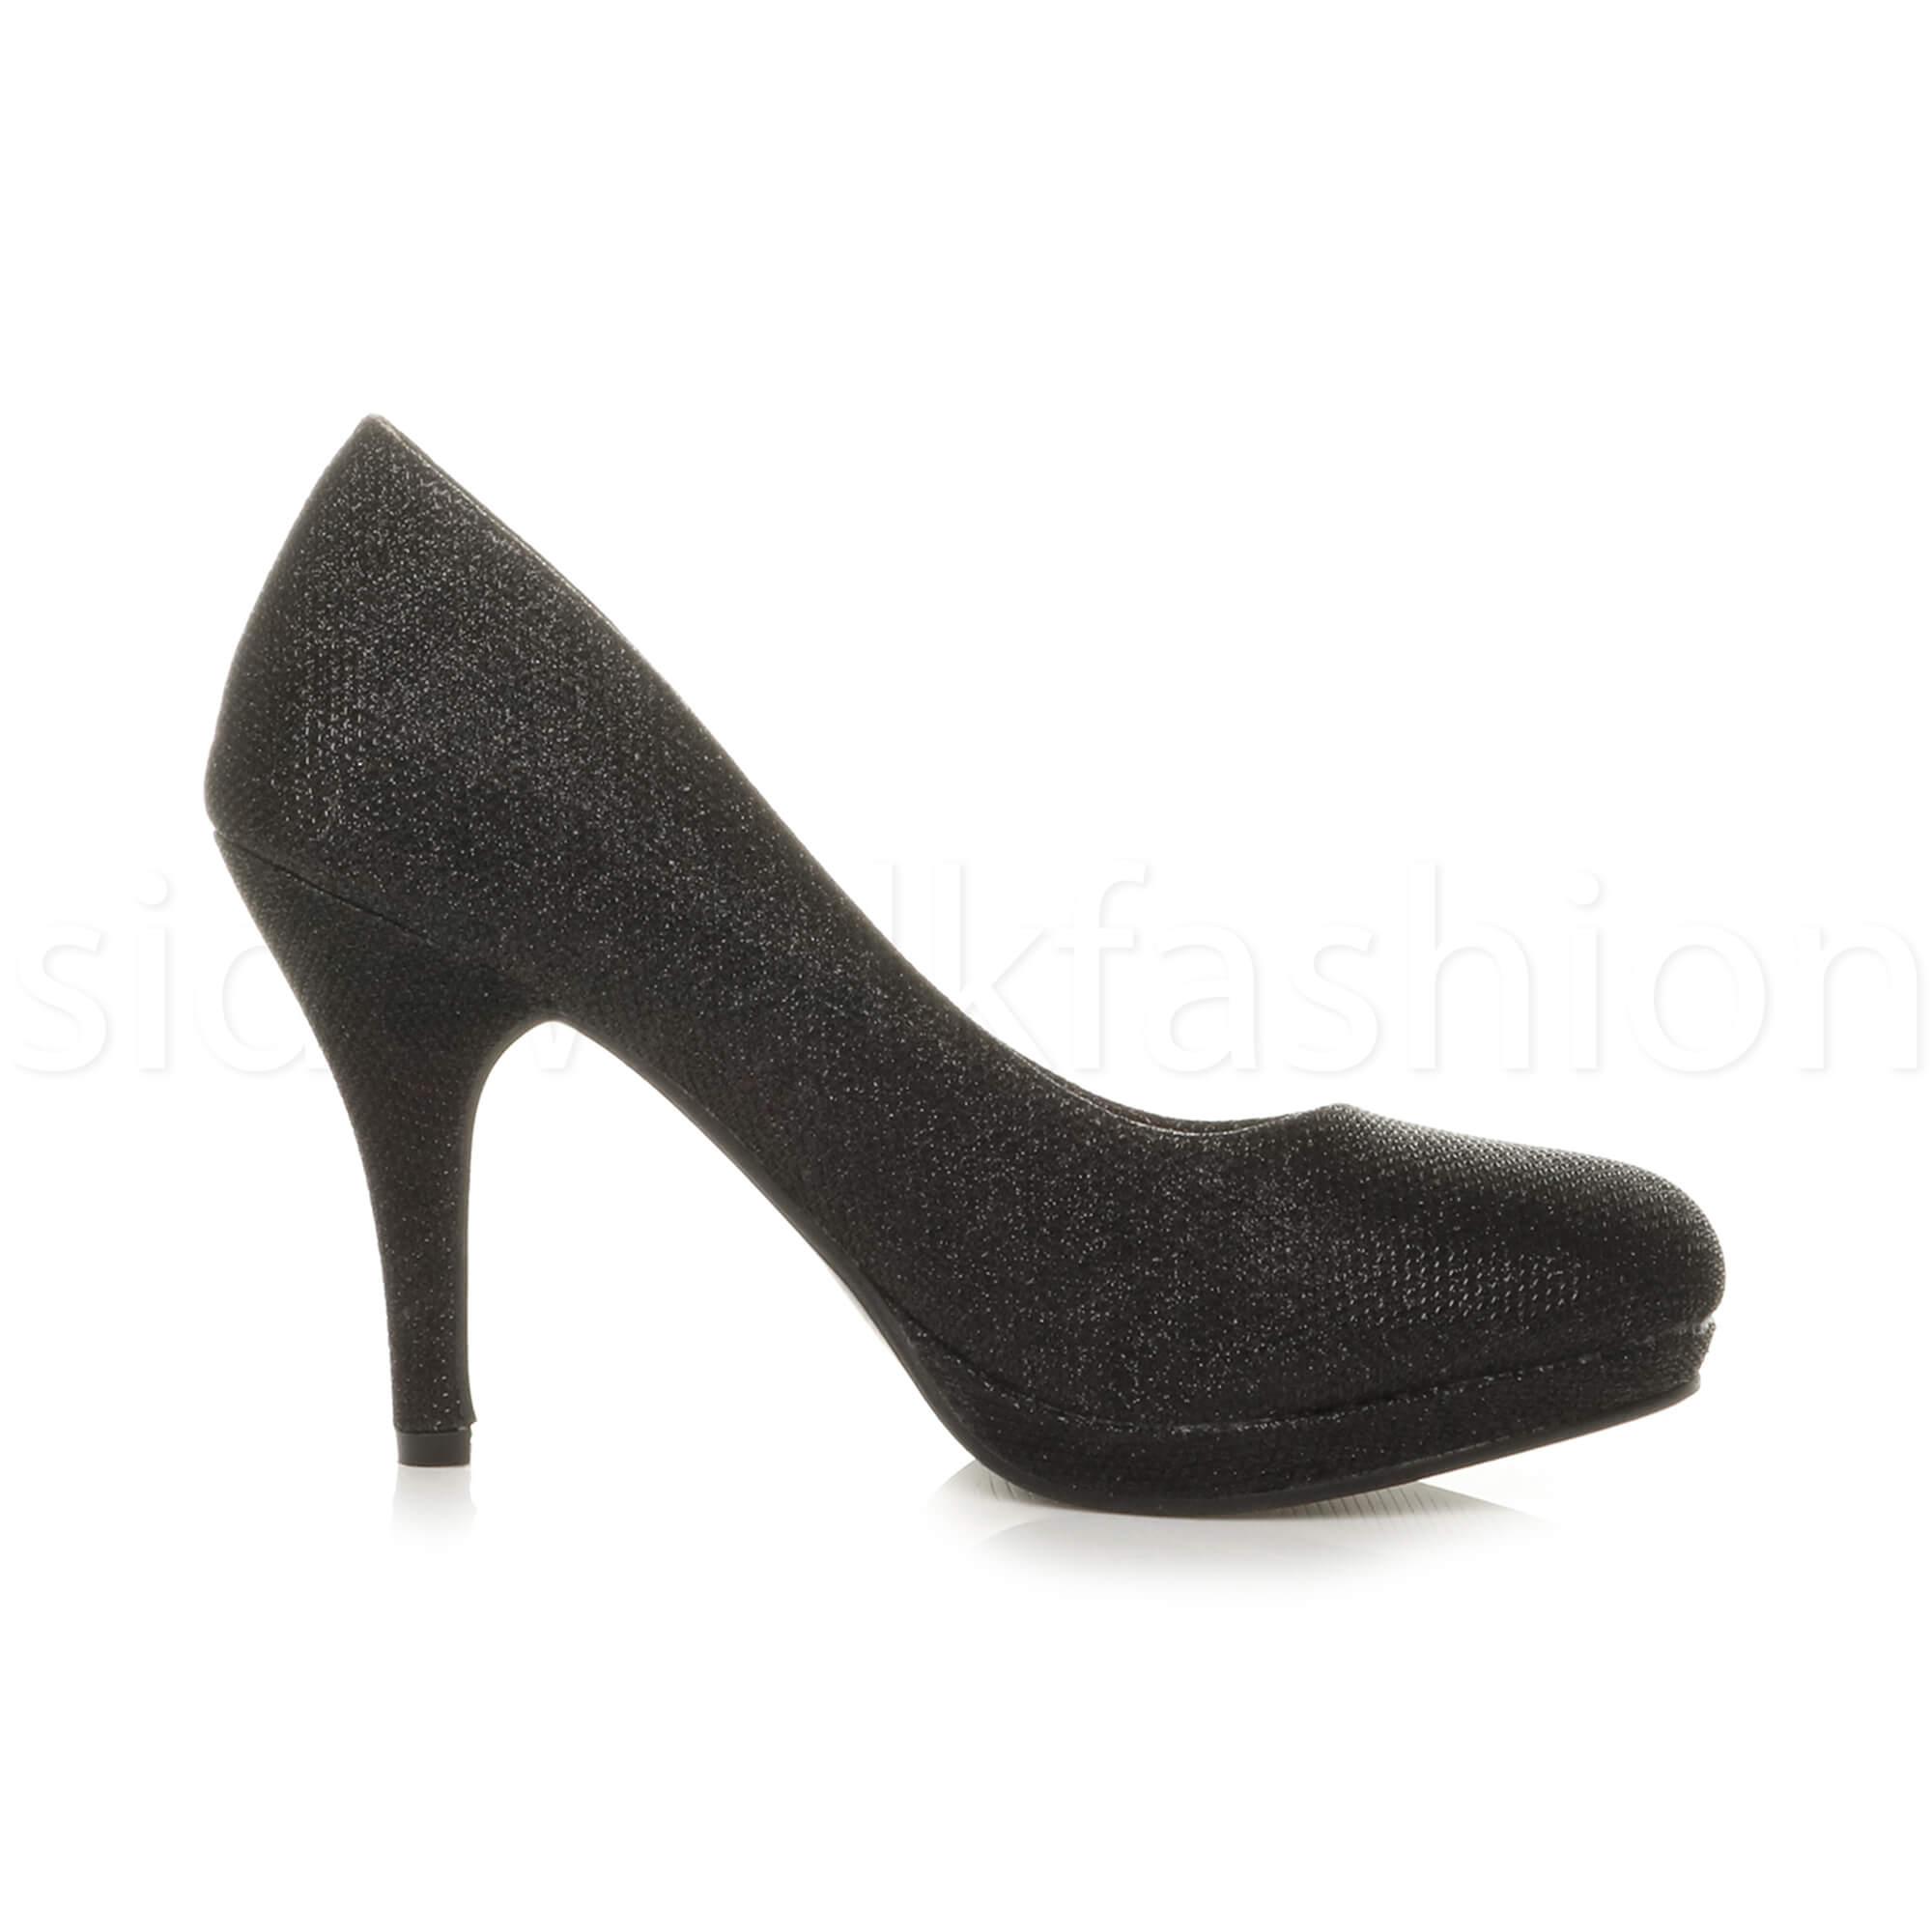 Womens-ladies-high-mid-heel-platform-wedding-evening-bridesmaid-court-shoes-size thumbnail 11